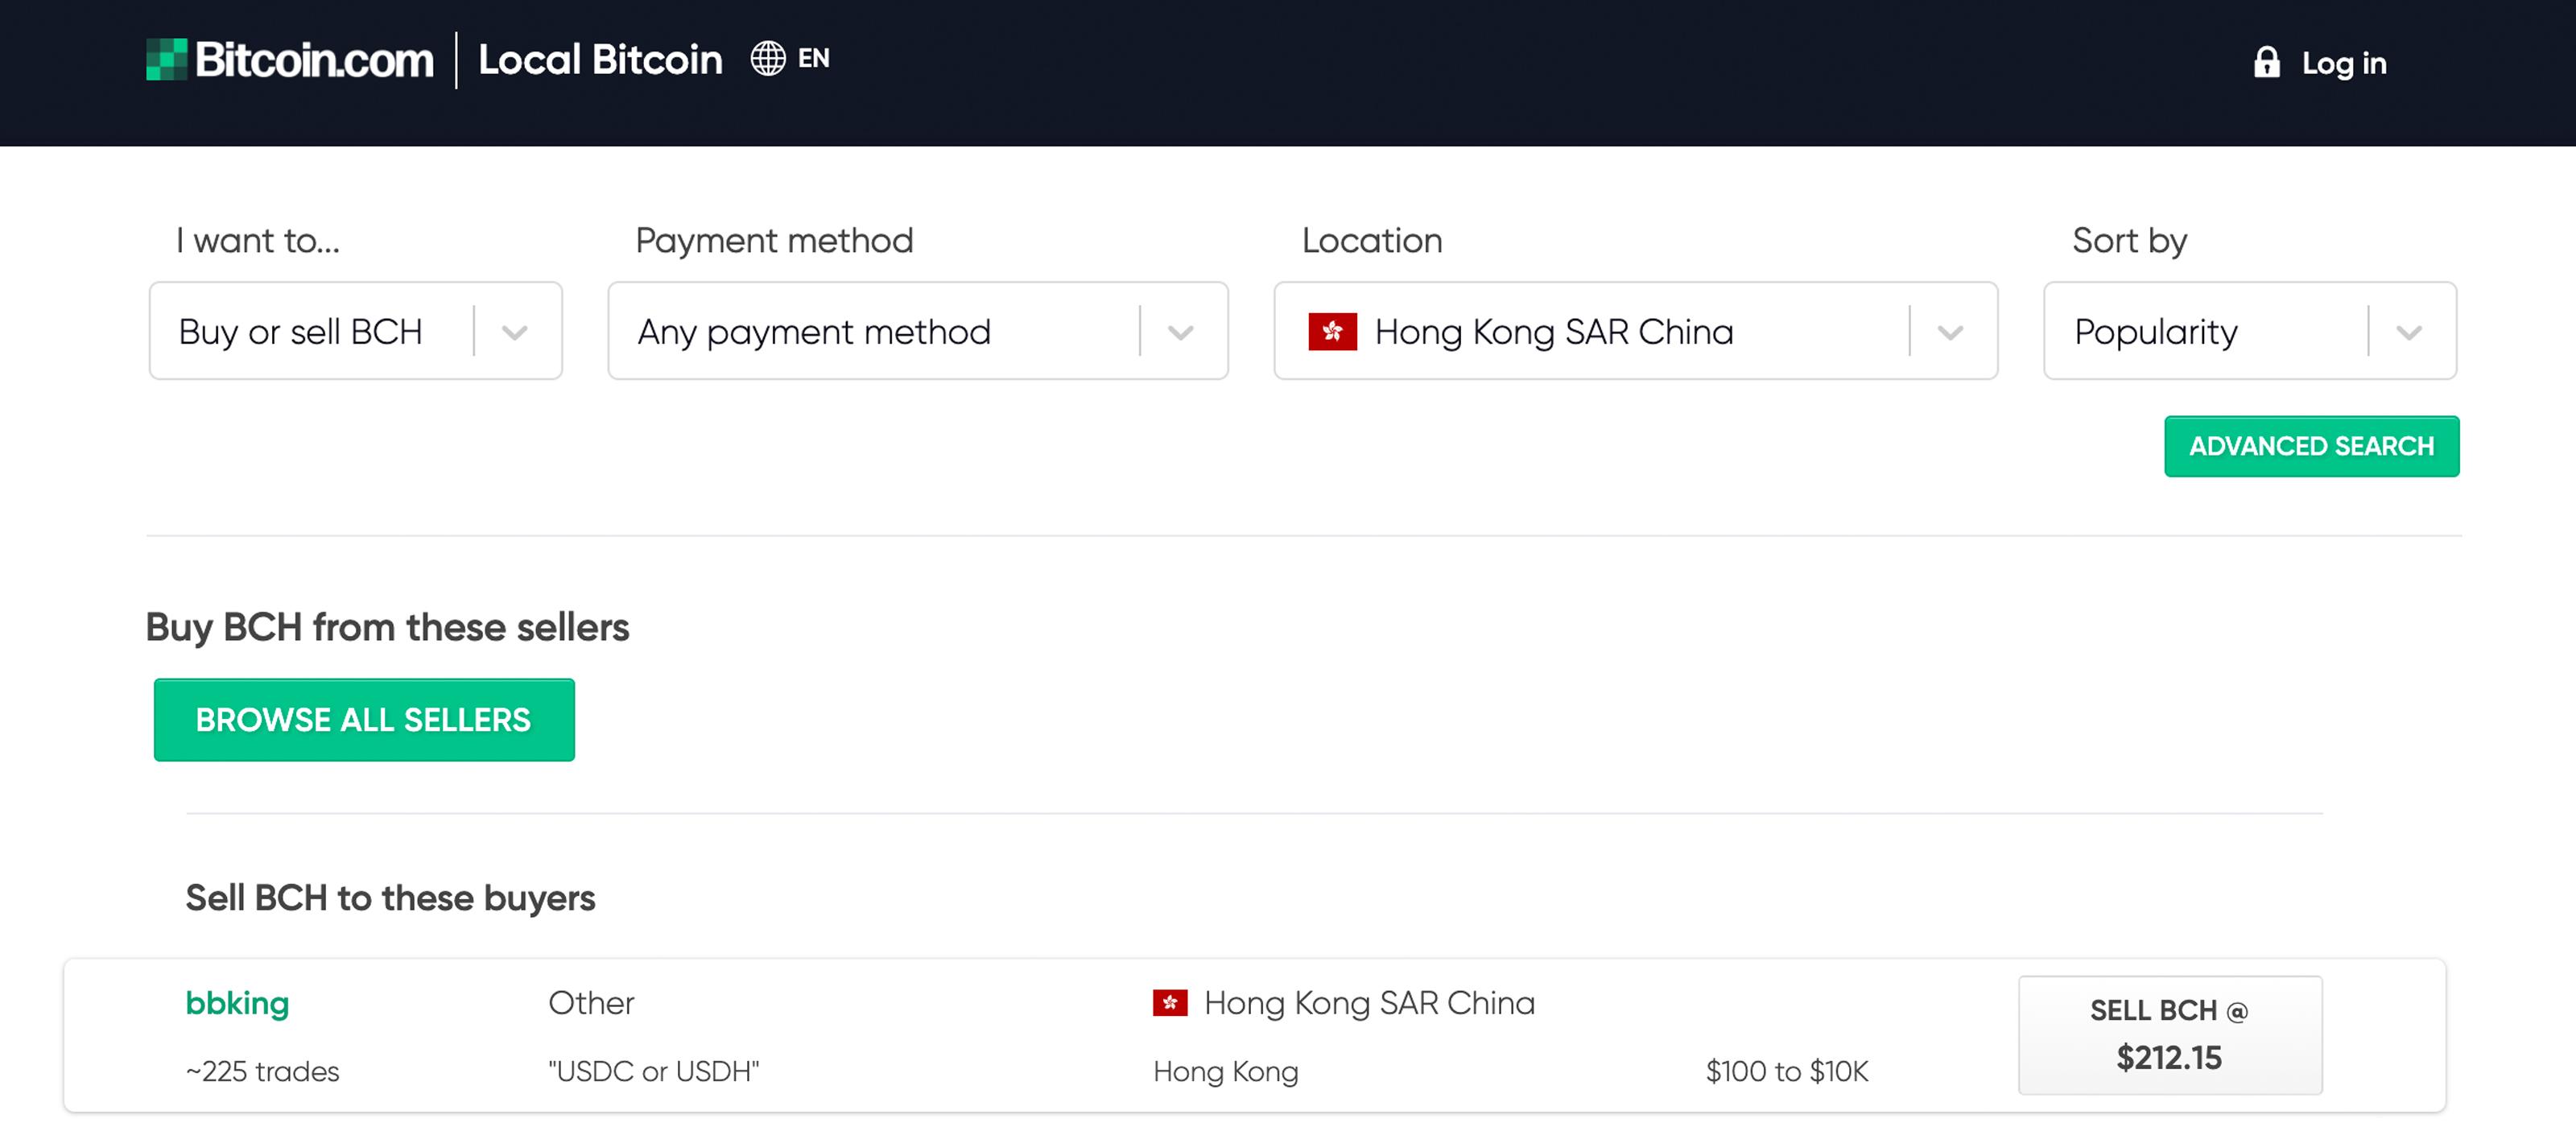 "Los manifestantes manejan herramientas de libertad mientras Hong Kong impone la dictadura ""width ="" 3200 ""height ="" 1400 ""srcset ="" https://news.bitcoin.com /wp-content/uploads/2019/10/hongklocalbch.jpg 3200w, https://news.bitcoin.com/wp-content/uploads/2019/10/hongklocalbch-300x131.jpg 300w, https: //news.bitcoin .com / wp-content / uploads / 2019/10 / hongklocalbch-768x336.jpg 768w, https://news.bitcoin.com/wp-content/uploads/2019/10/hongklocalbch-1024x448.jpg 1024w, https: / /news.bitcoin.com/wp-content/uploads/2019/10/hongklocalbch-696x305.jpg 696w, https://news.bitcoin.com/wp-content/uploads/2019/10/hongklocalbch-1392x609.jpg 1392w , https://news.bitcoin.com/wp-content/uploads/2019/10/hongklocalbch-1068x467.jpg 1068w, https://news.bitcoin.com/wp-content/uploads/2019/10/hongklocalbch- 960x420.jpg 960w ""tamaños ="" (ancho máximo: 3200 px) 100vw, 3200 px"